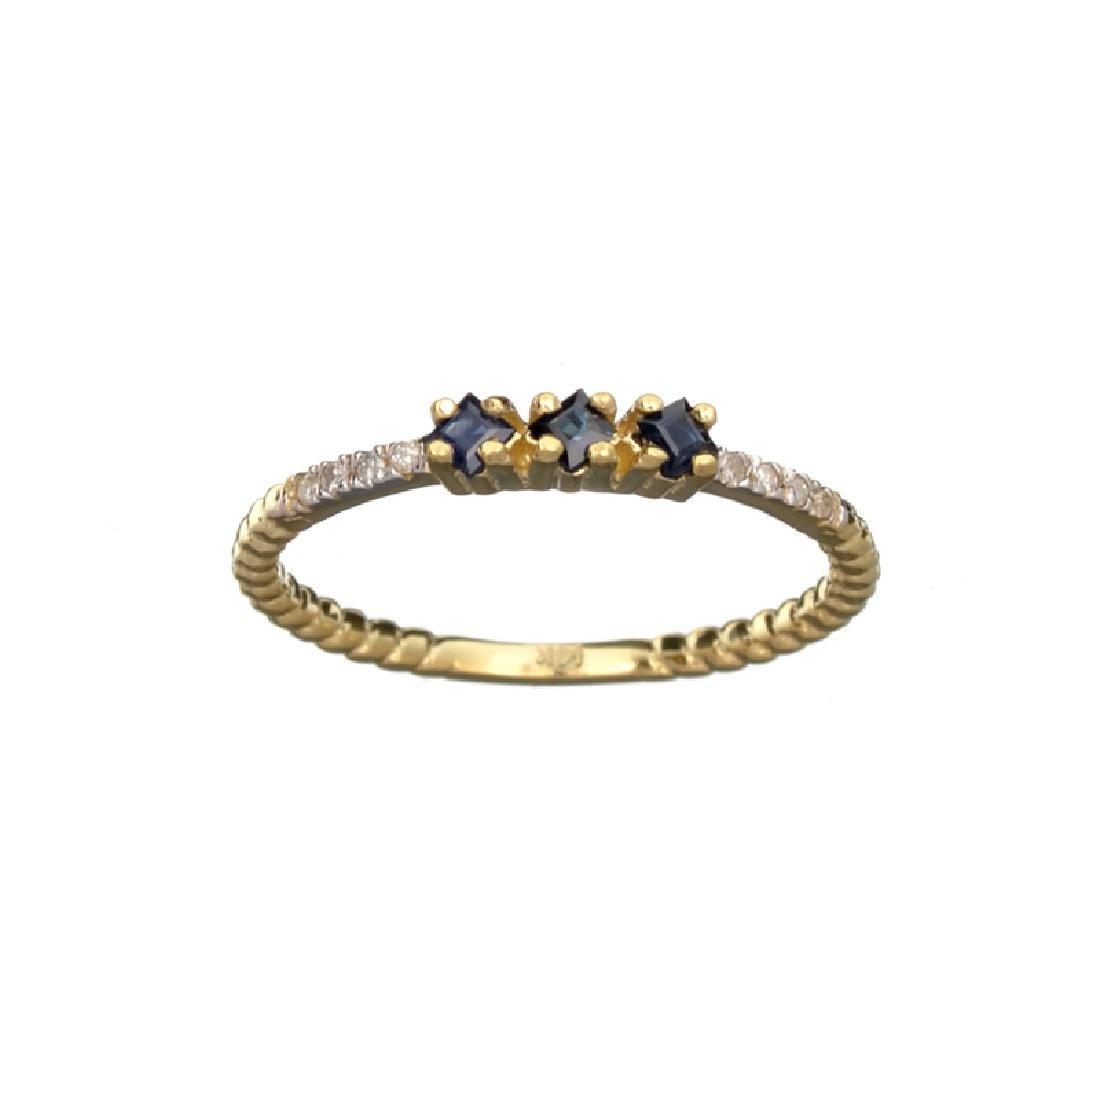 APP: 0.6k Fine Jewelry 14KT Gold, 0.23CT Blue Sapphire